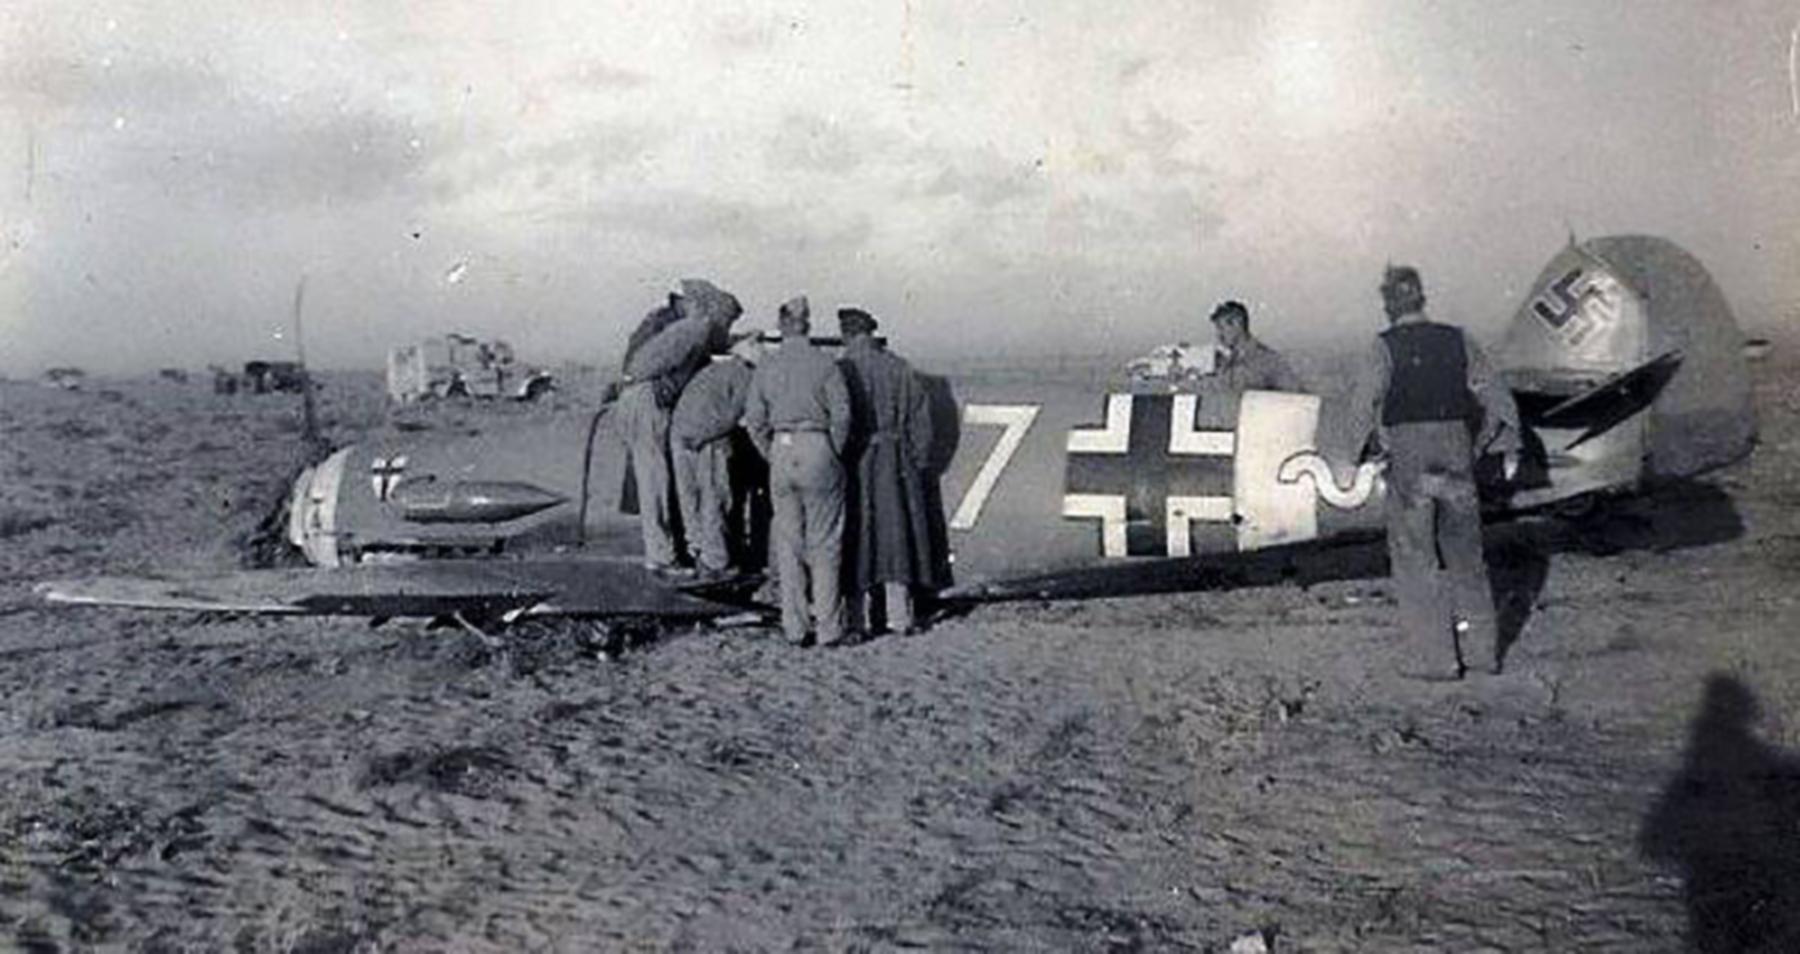 Messerschmitt Bf 109F4Trop 9.JG27 Yellow 7 Helmuth Fenzl WNr 13136 crash Egypt 26th Oct 1942 03